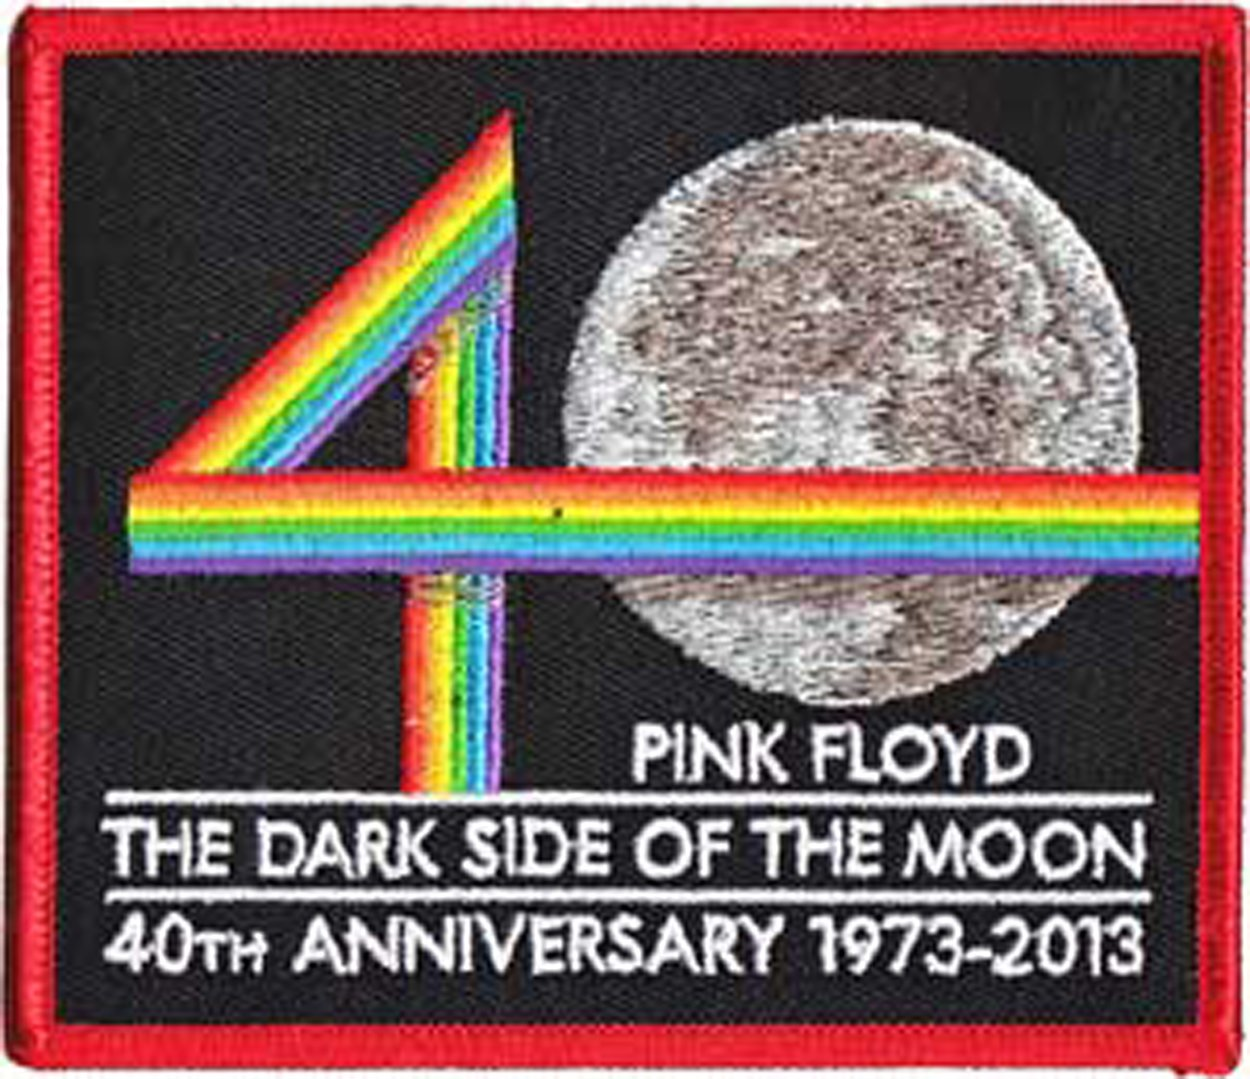 Application Pink Floyd TDSOTM Moon Patch   B00HE0CCEQ